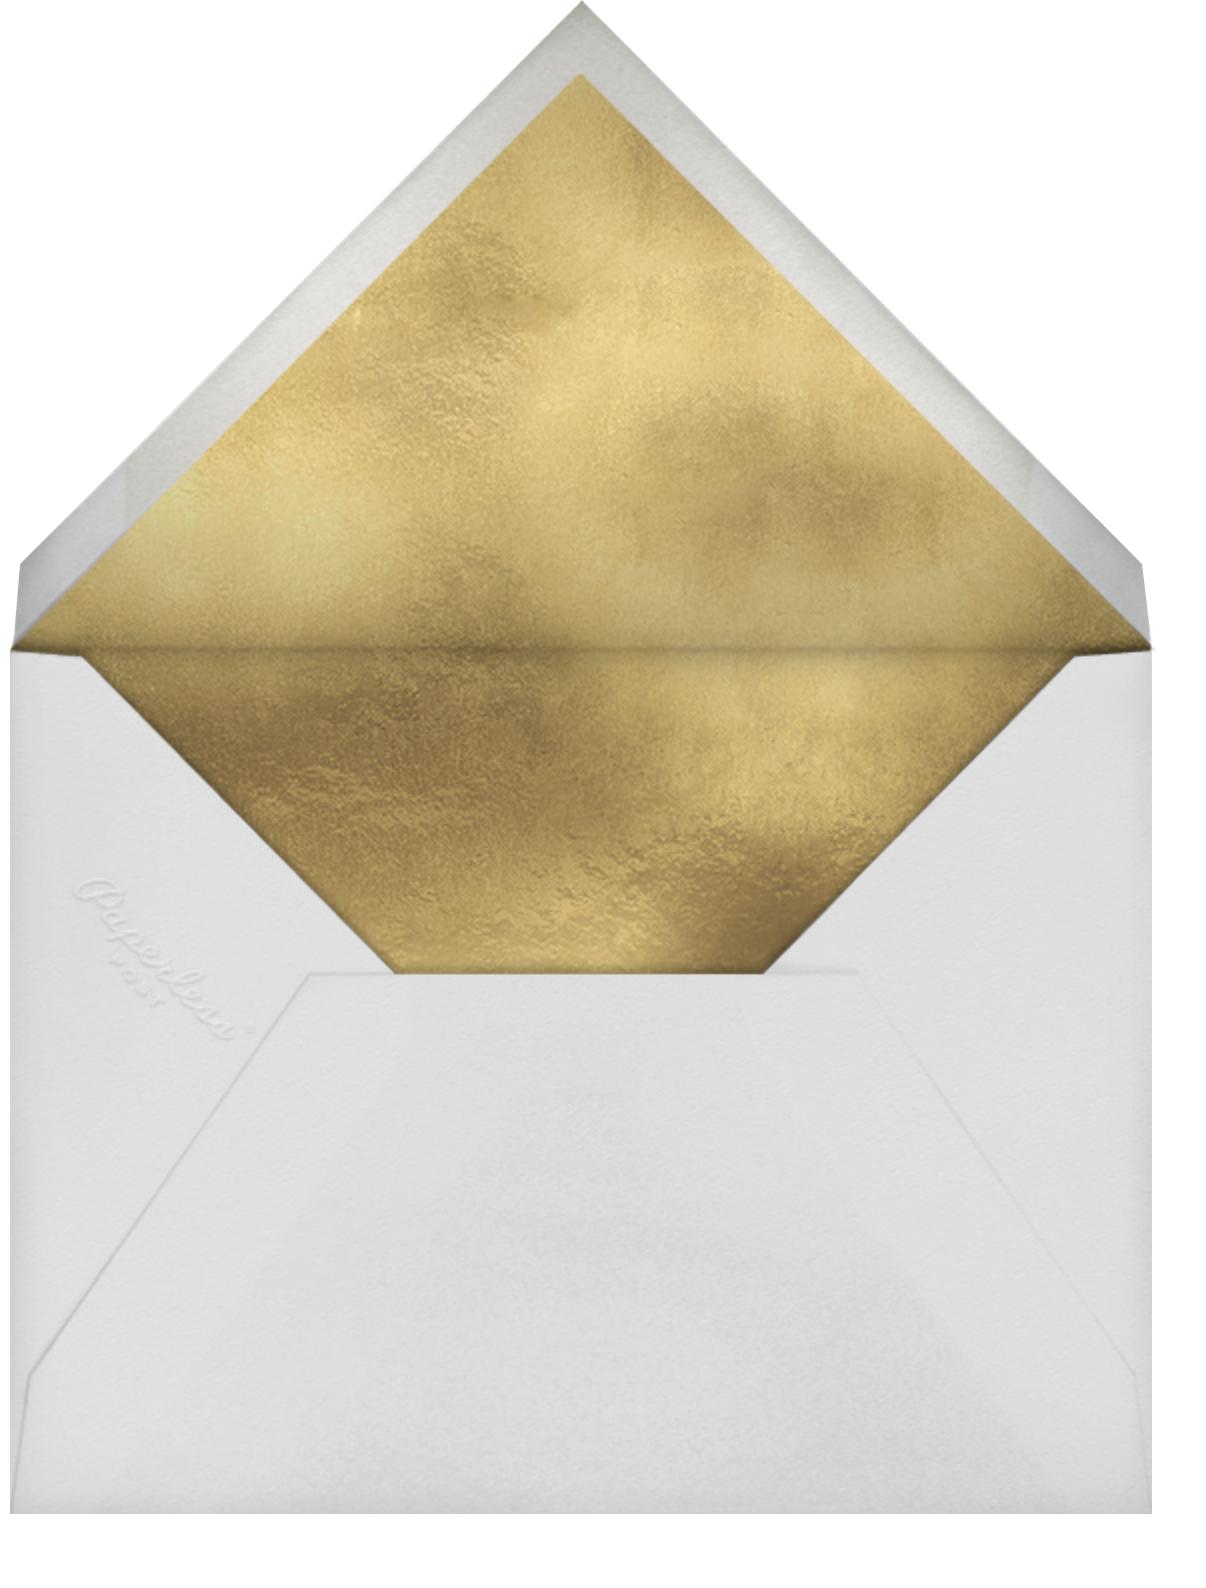 Long Stems - Metallic - kate spade new york - New Year's Eve - envelope back